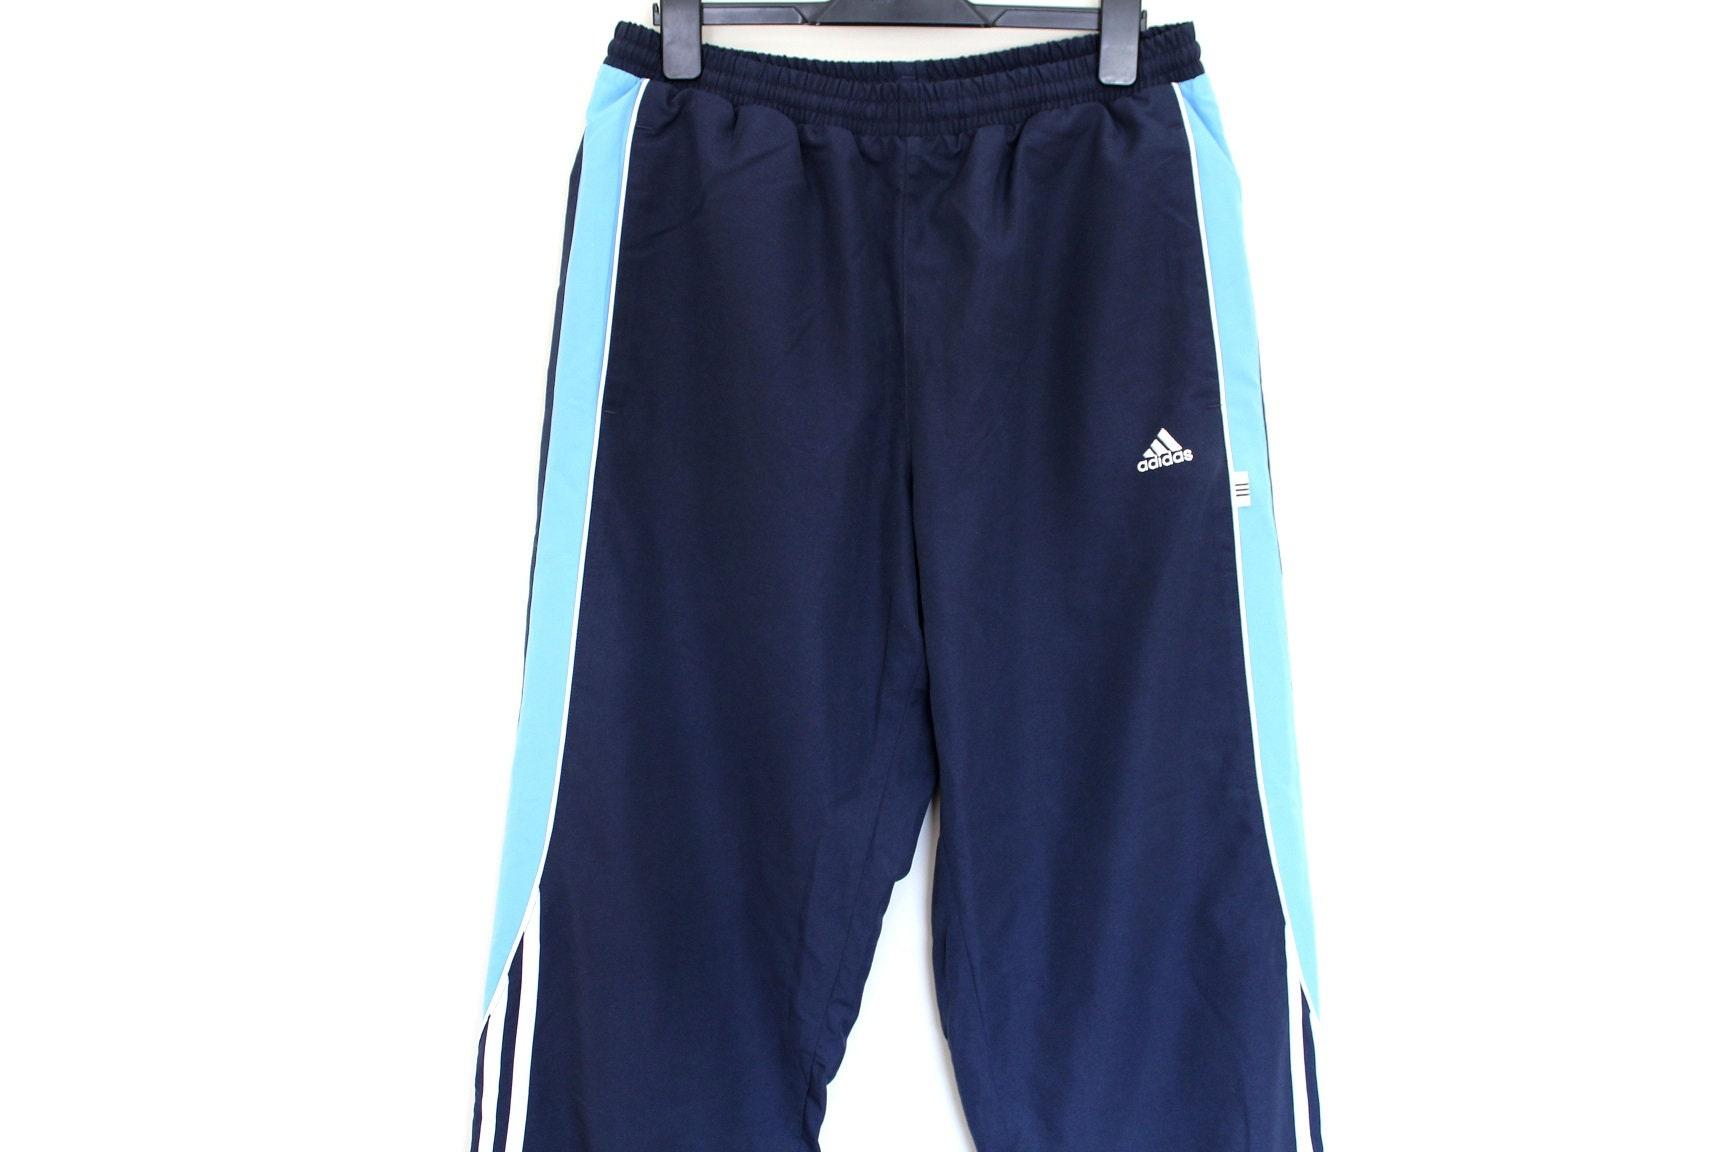 Blue Adidas Pants Vintage Adidas Trousers Hip Hop Streetwear  d6d505db12b3